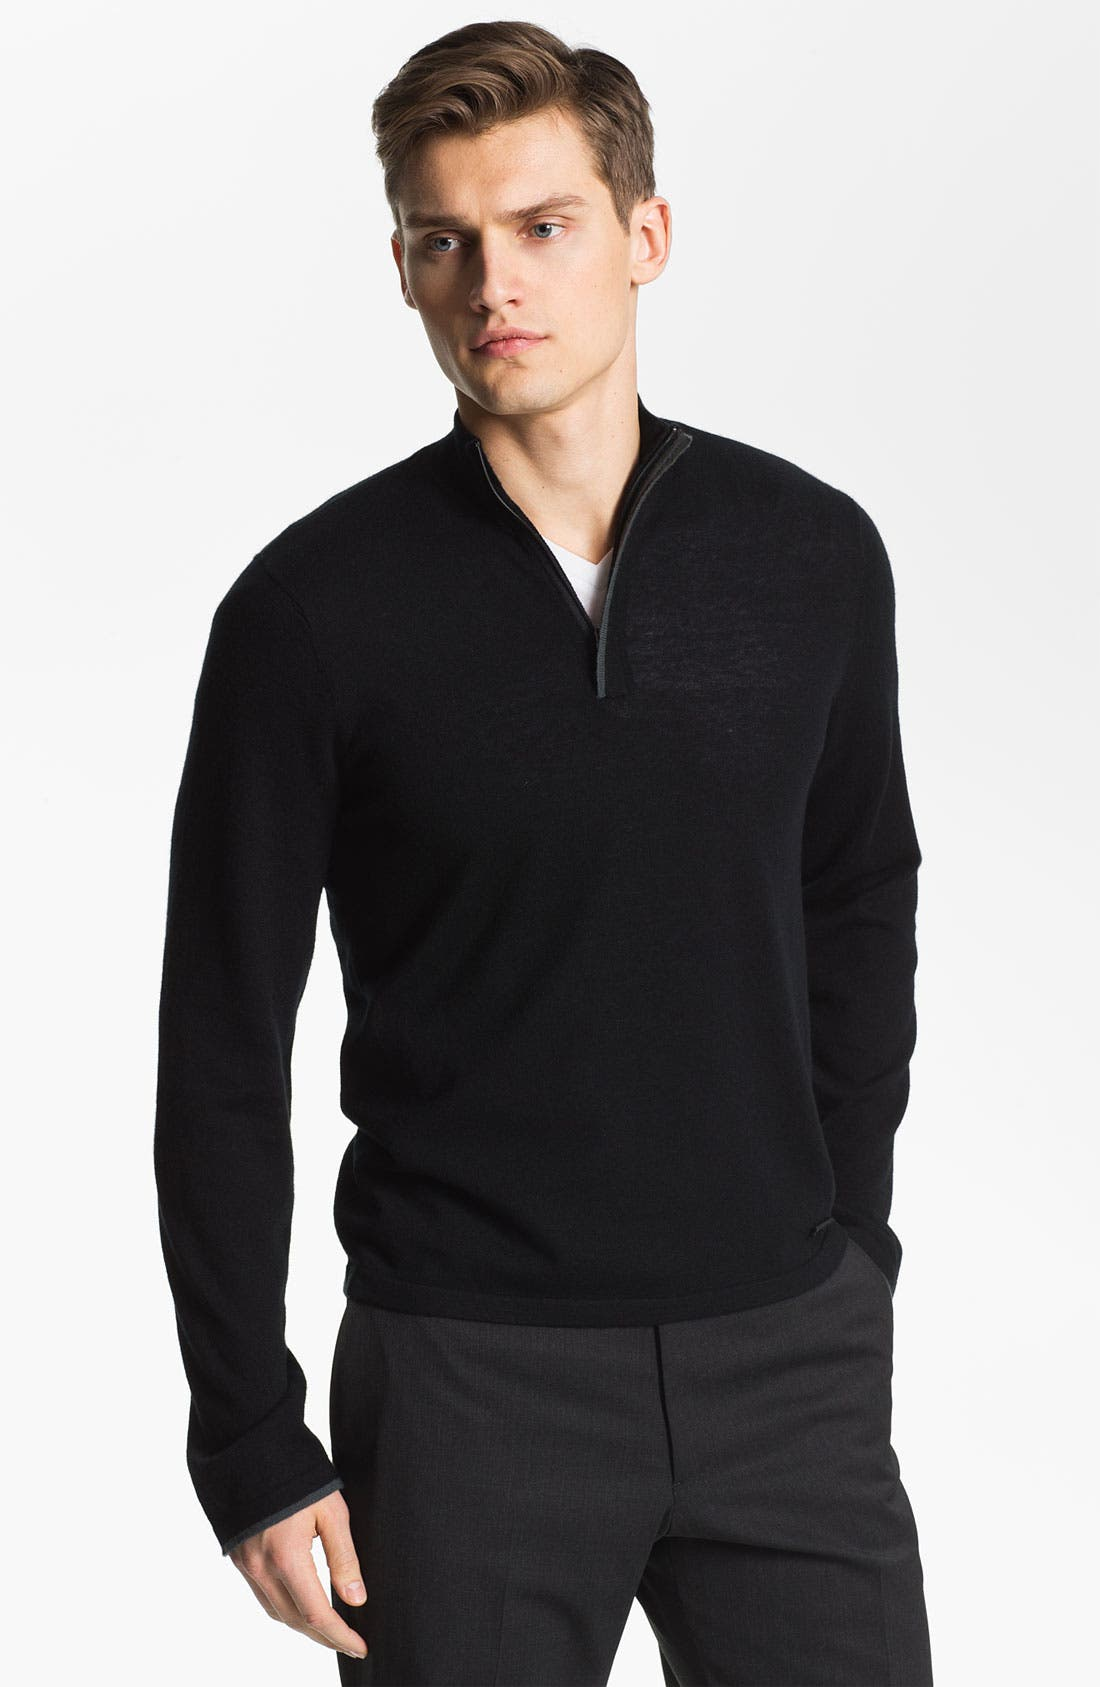 Alternate Image 1 Selected - Armani Collezioni Quarter Zip Cashmere Sweater